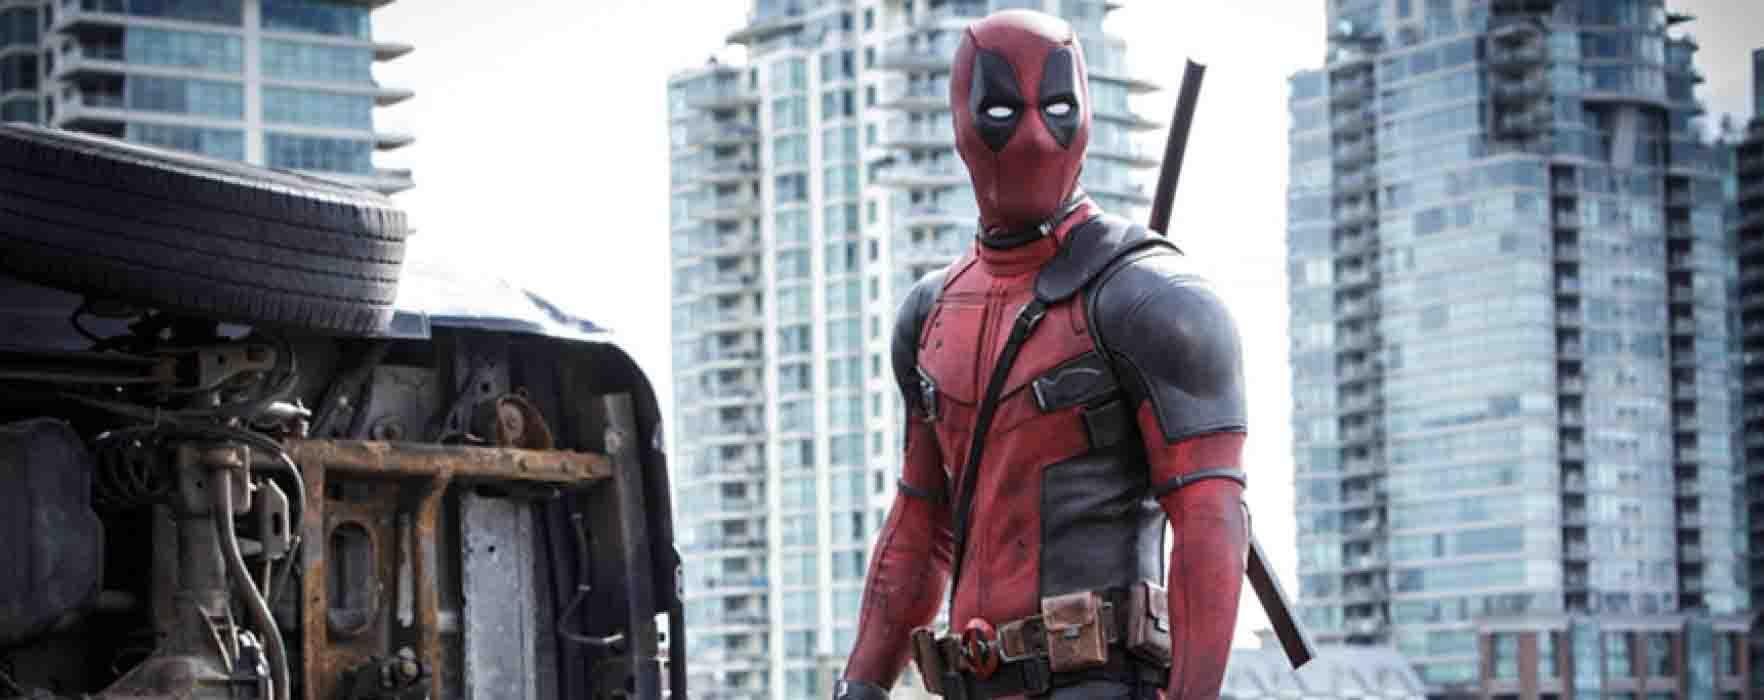 Deadpool Marvel Fresh Start Reboot on the Way